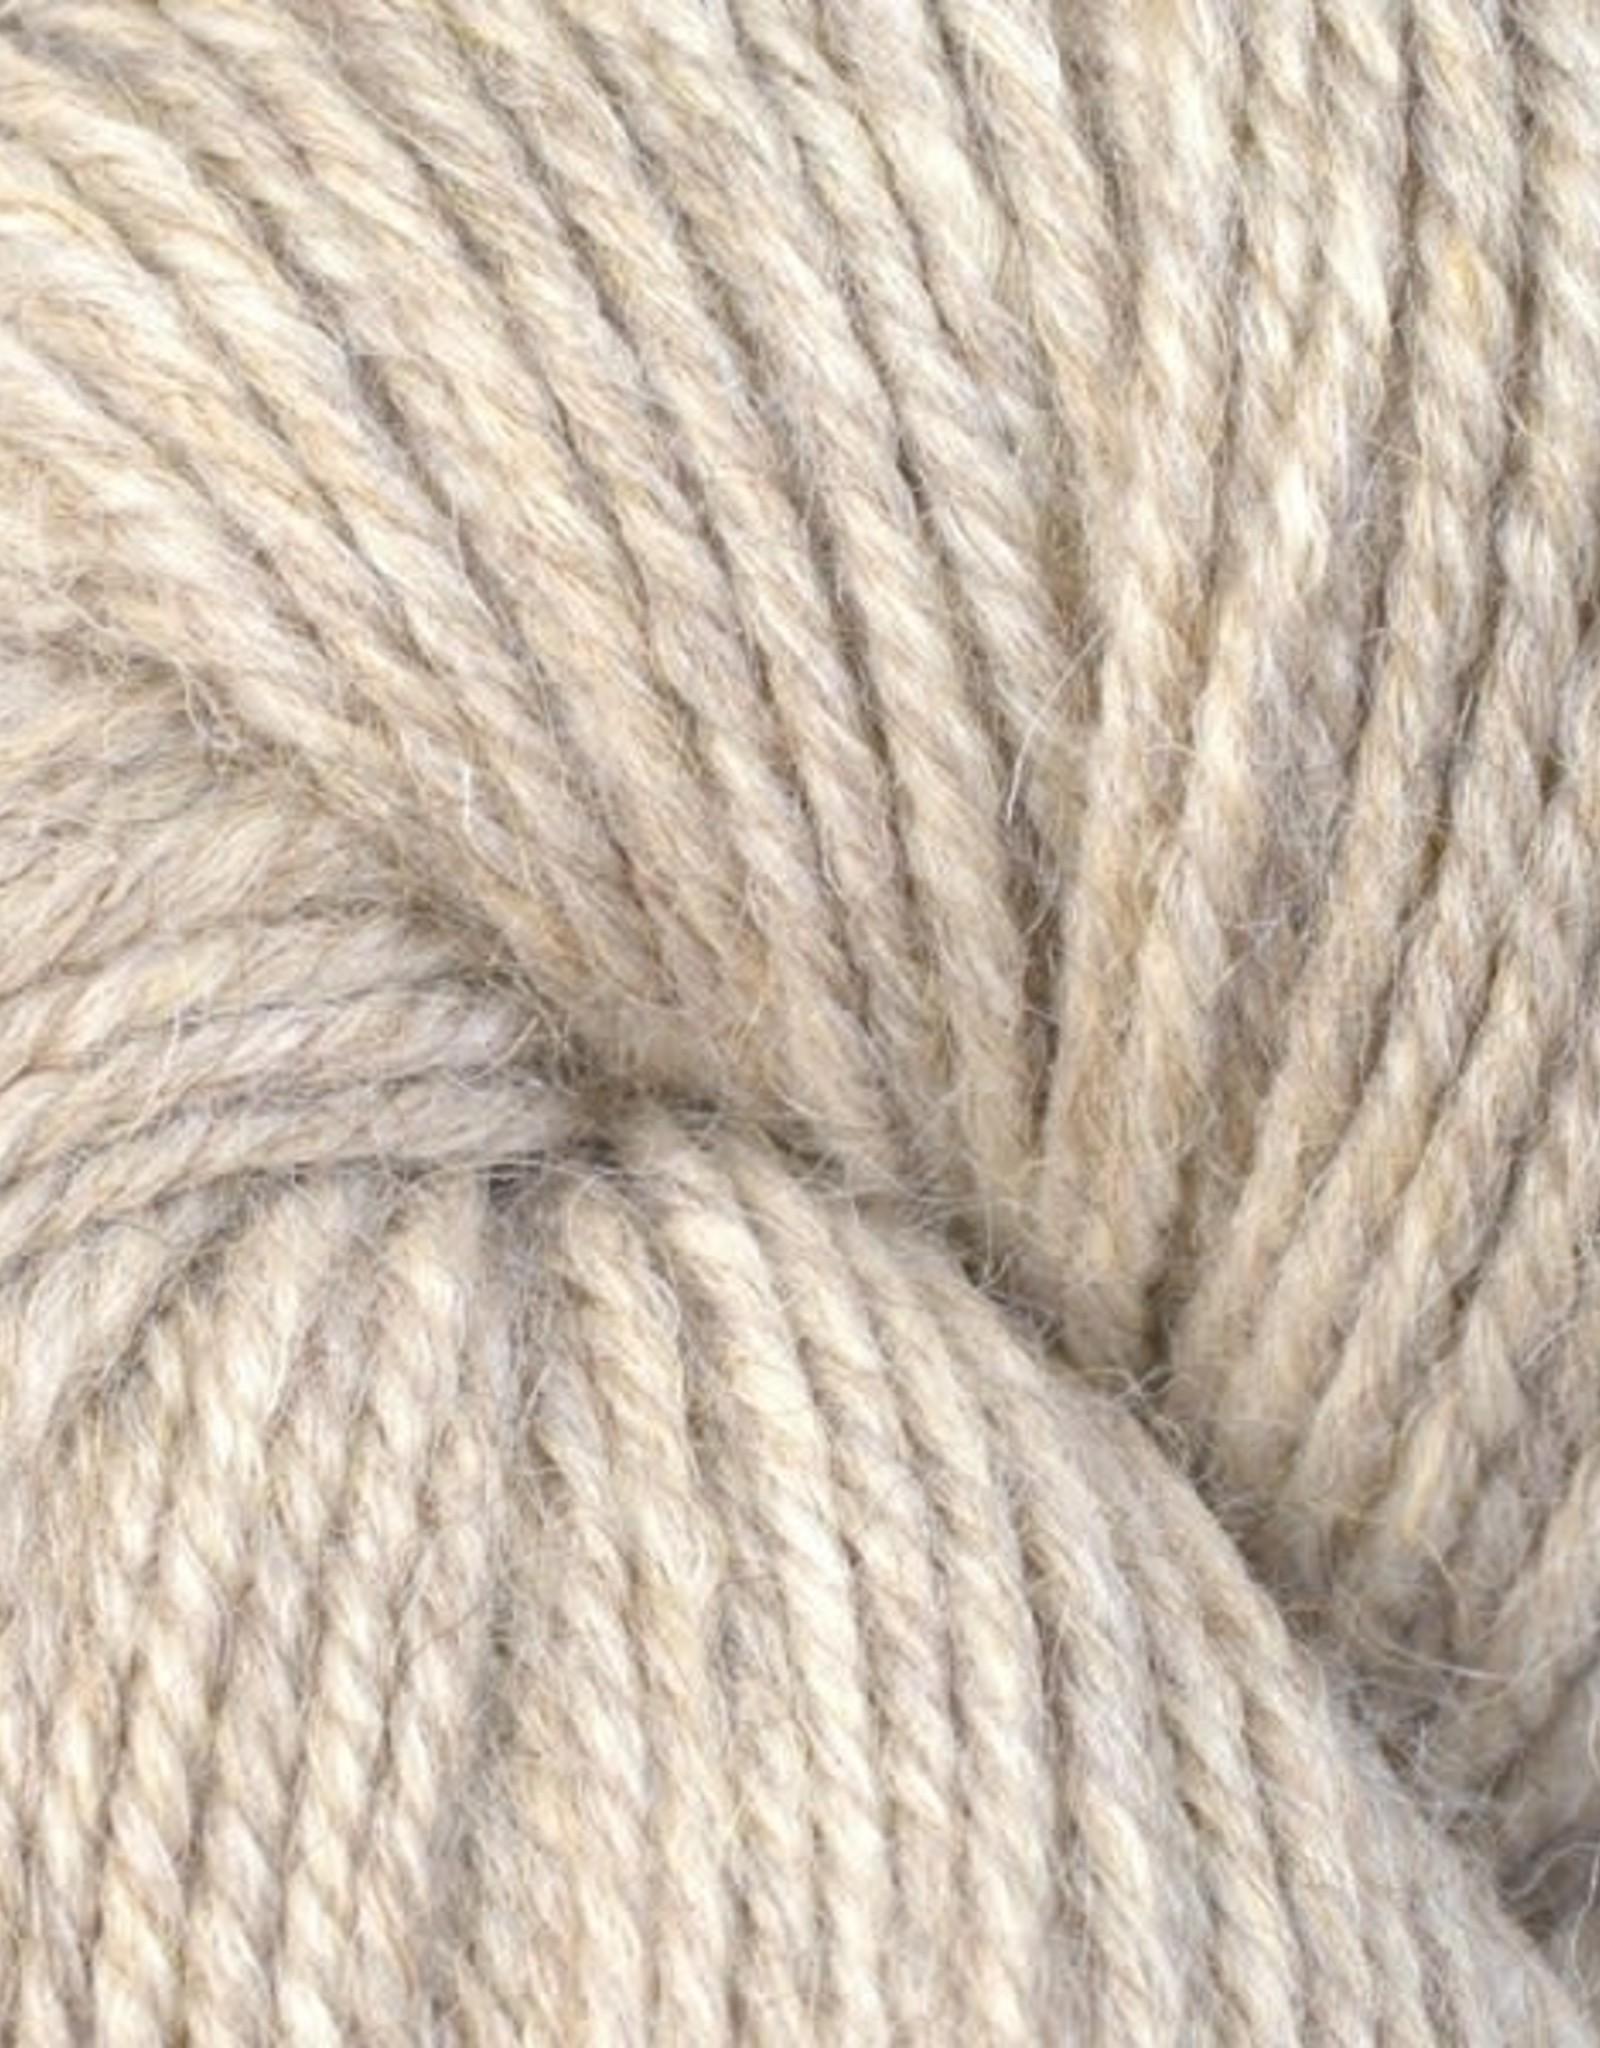 Berroco Ultra Alpaca Worst 62189 barley